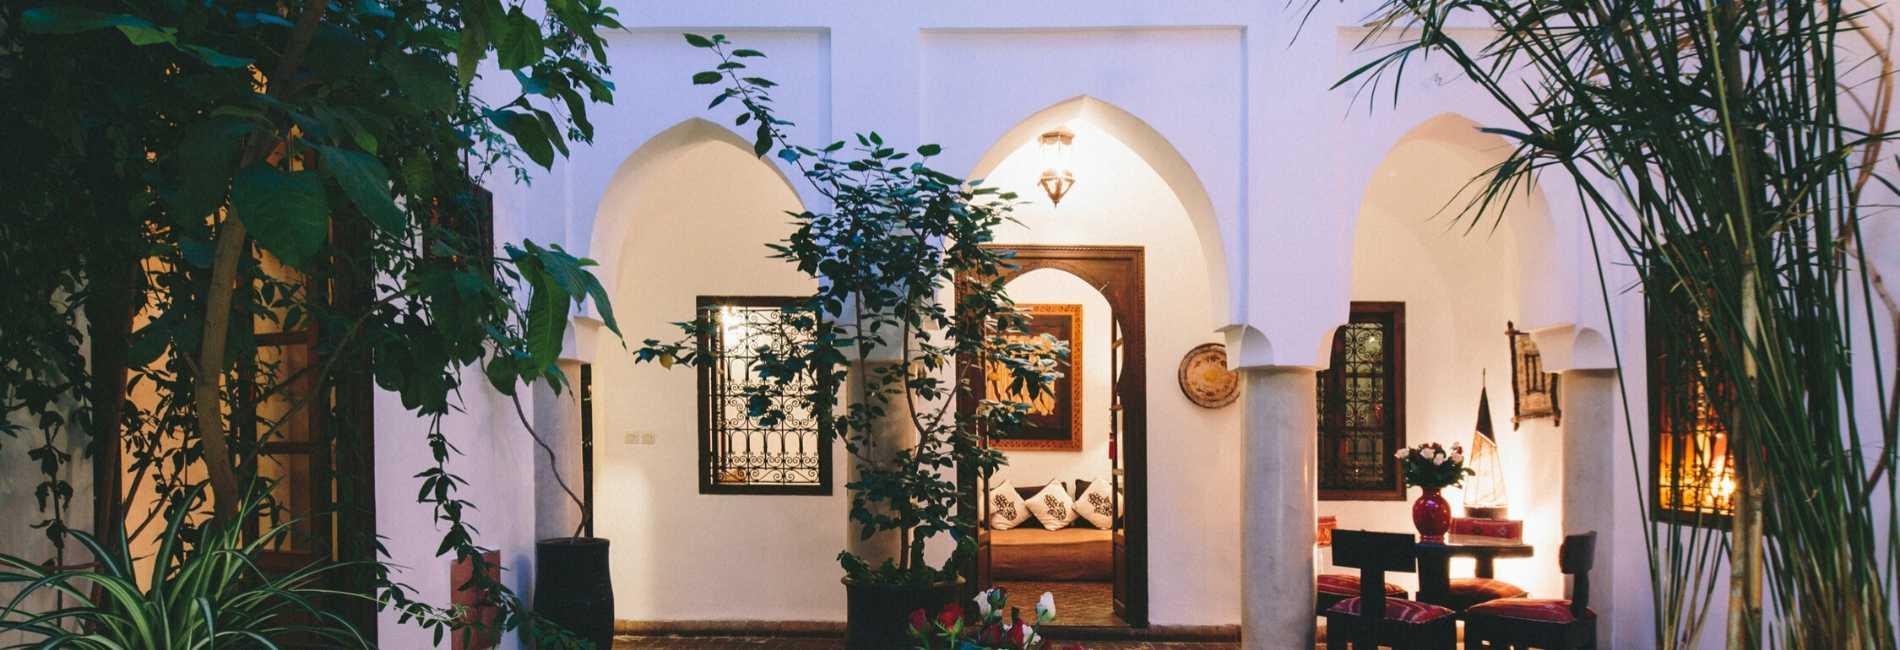 riad marrakech courtyard